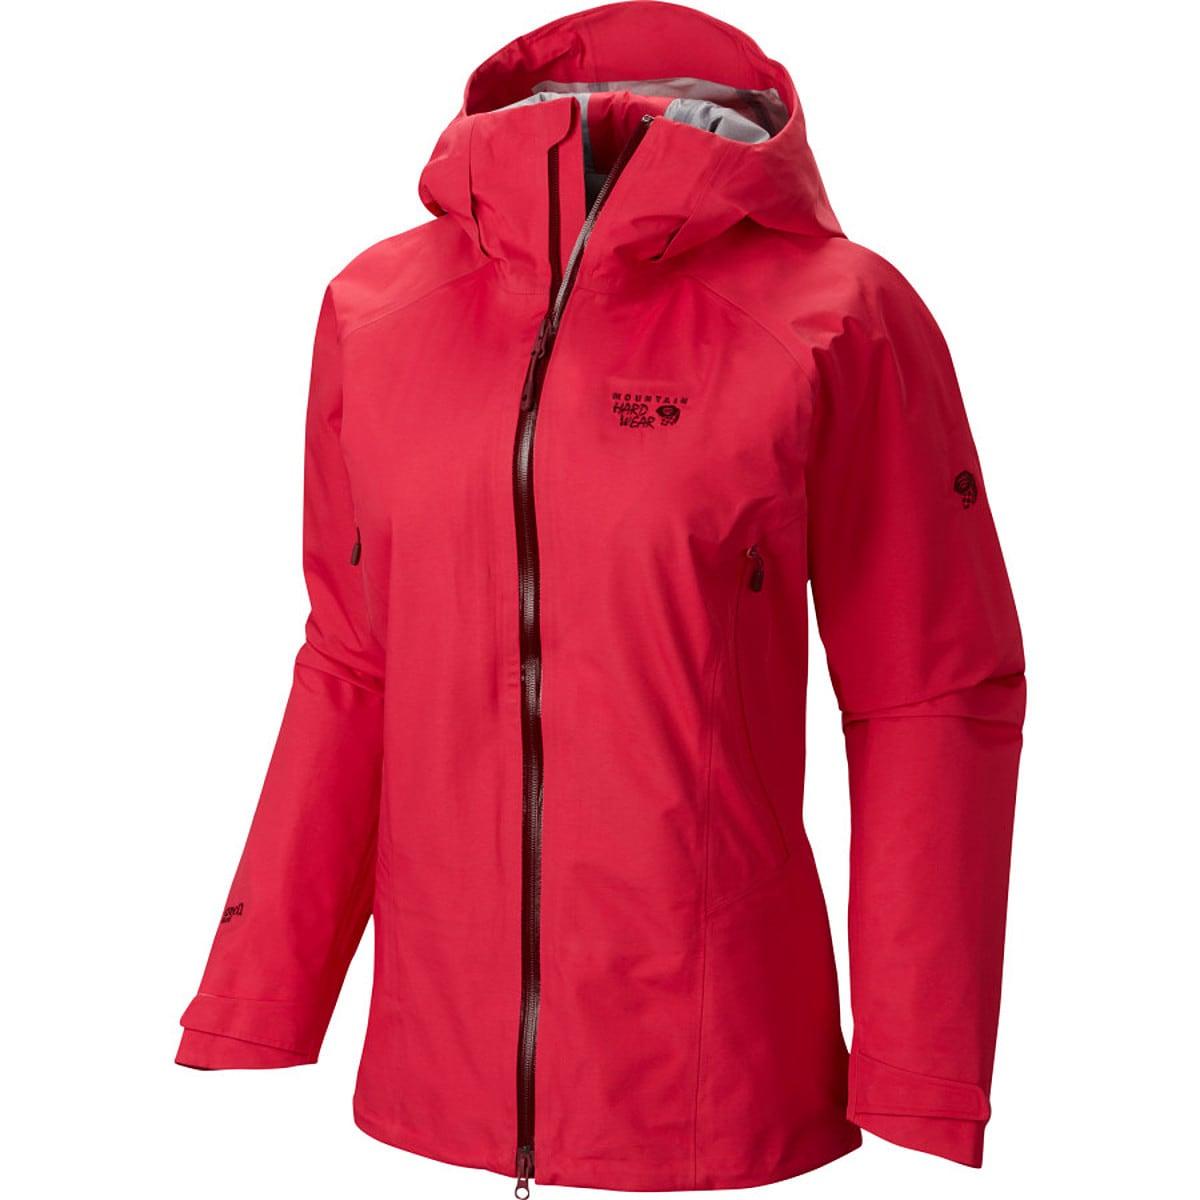 Mountain Hardwear Torsun Jacket - Women